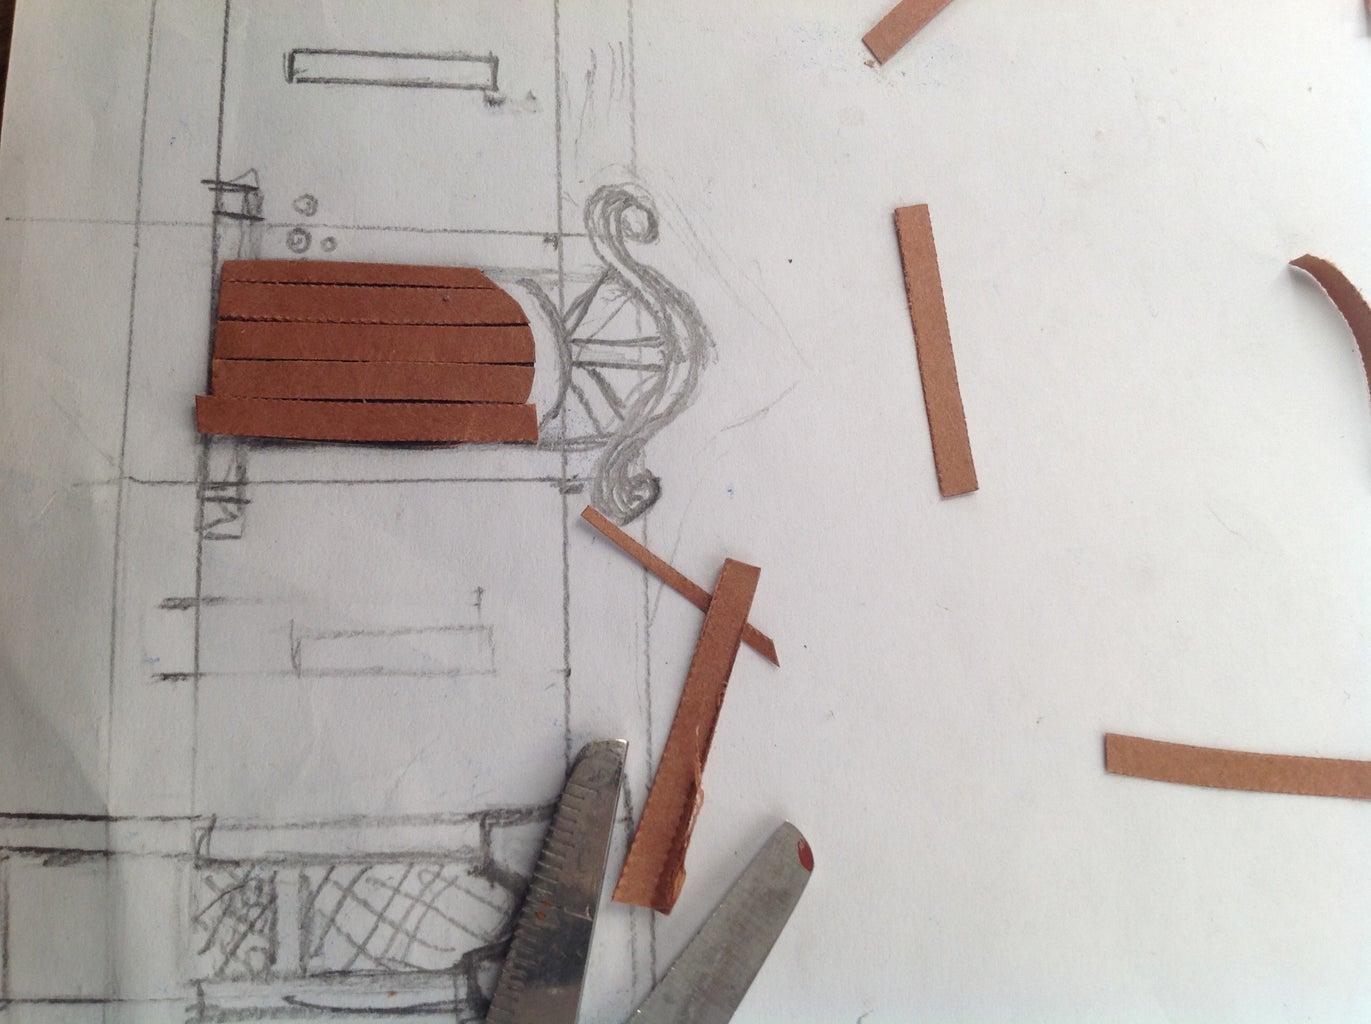 The Main Windor Ledge and Door